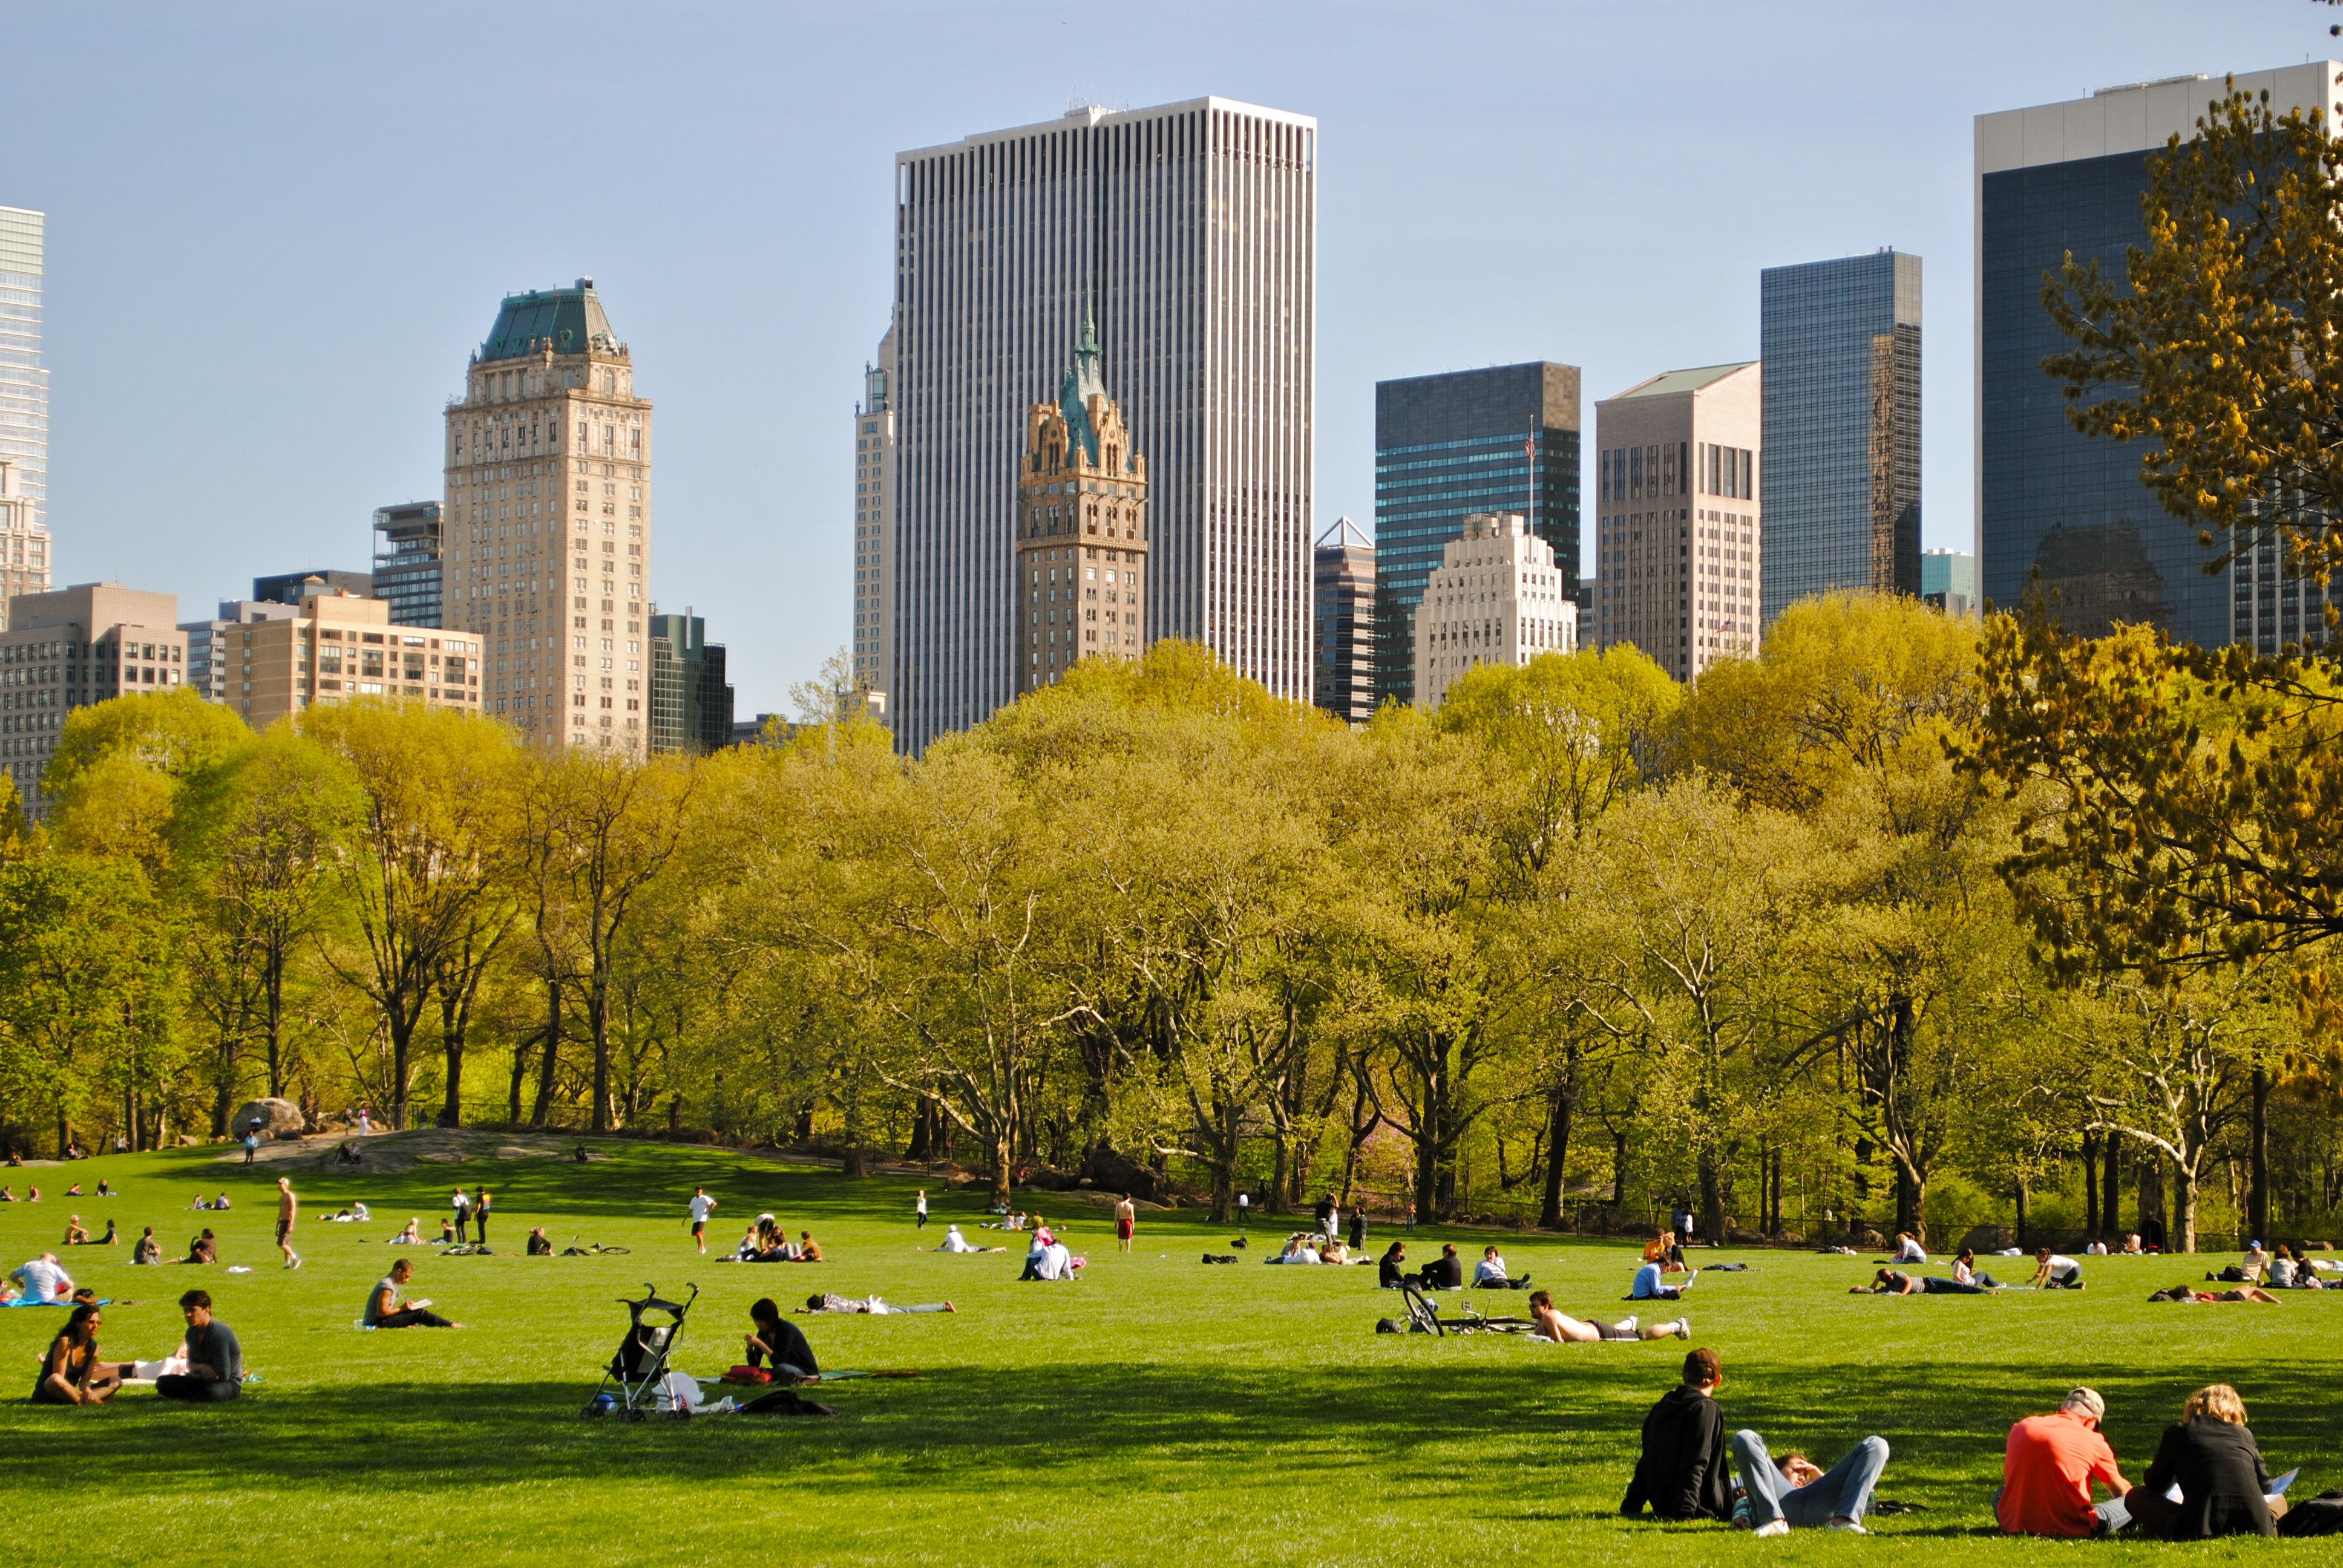 central-park-nova-york-sheep-meadow